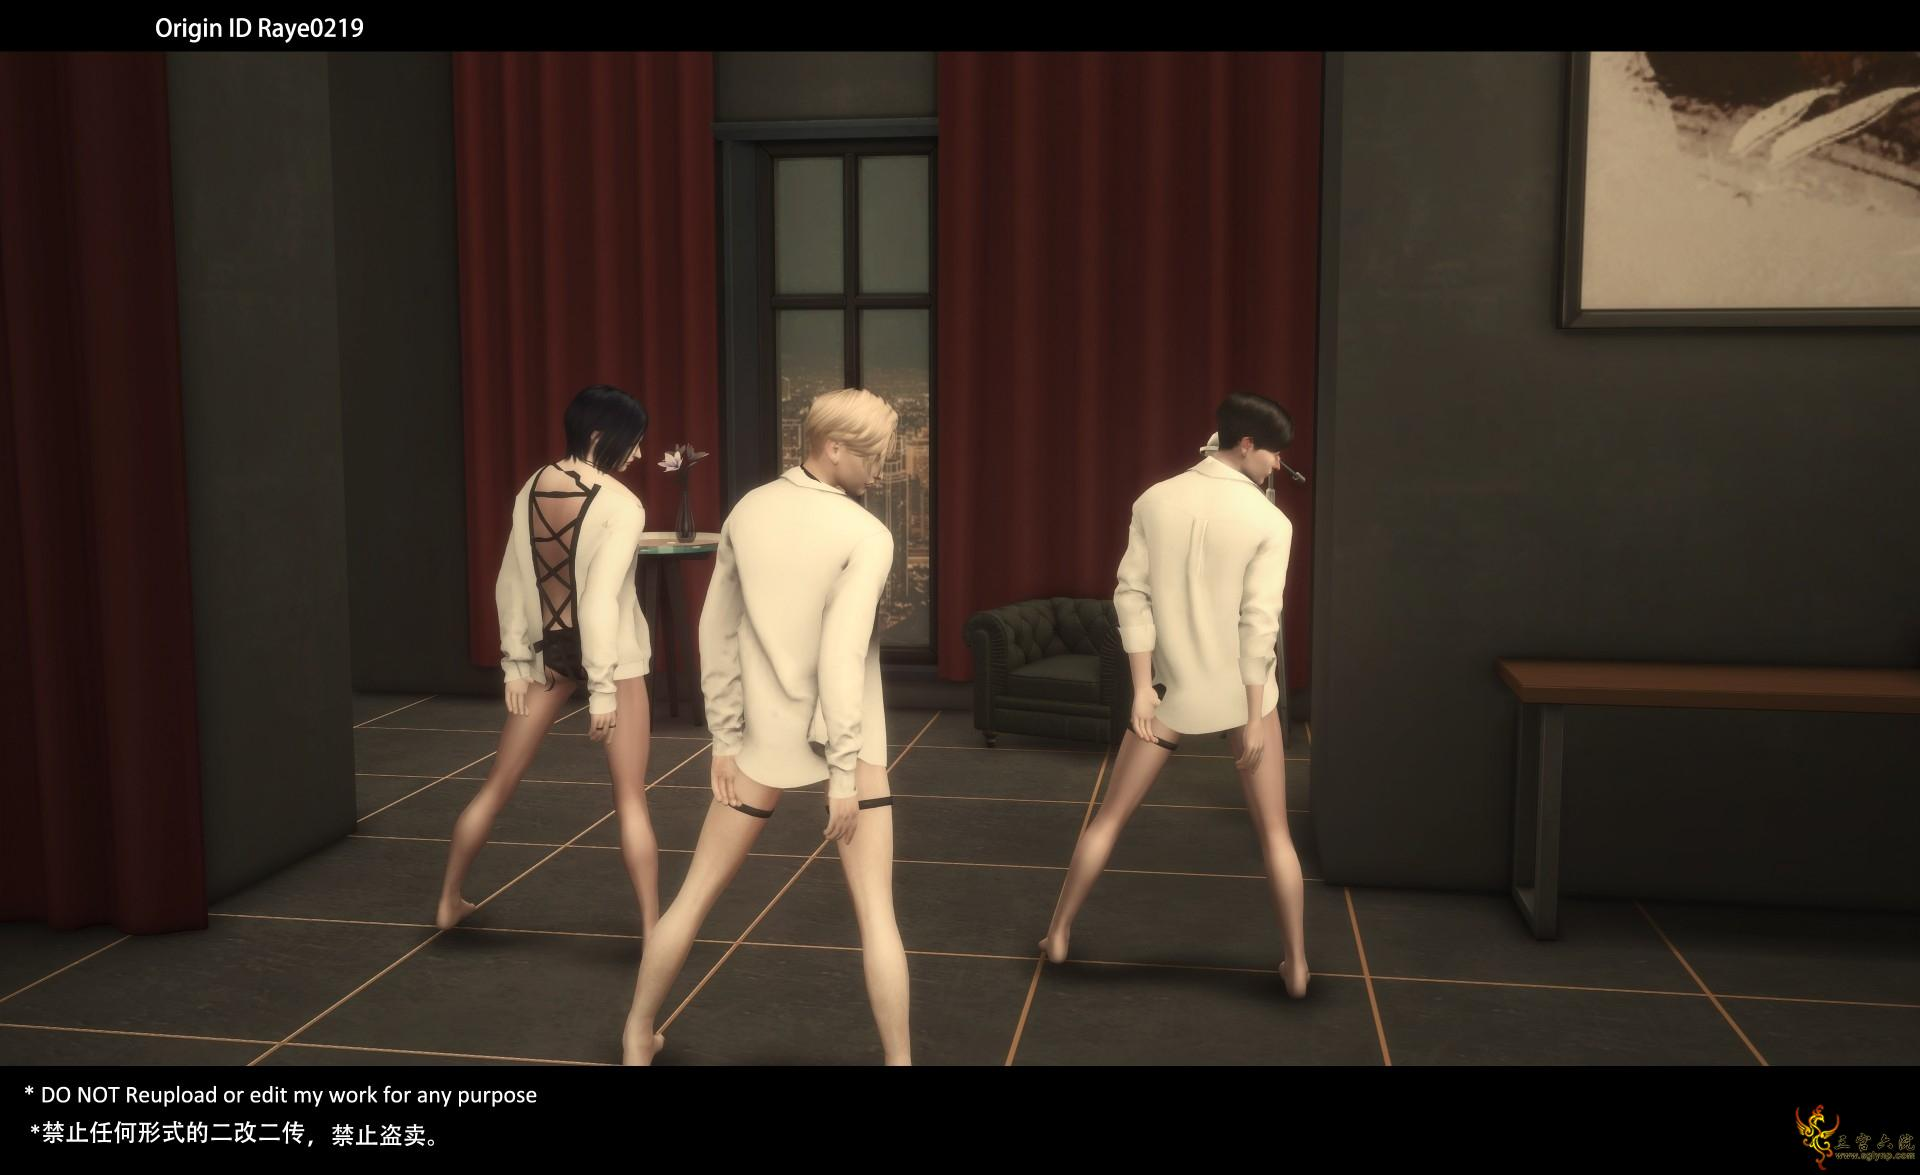 【R219】MMD Dance Pose Conqueror 08 .jpg